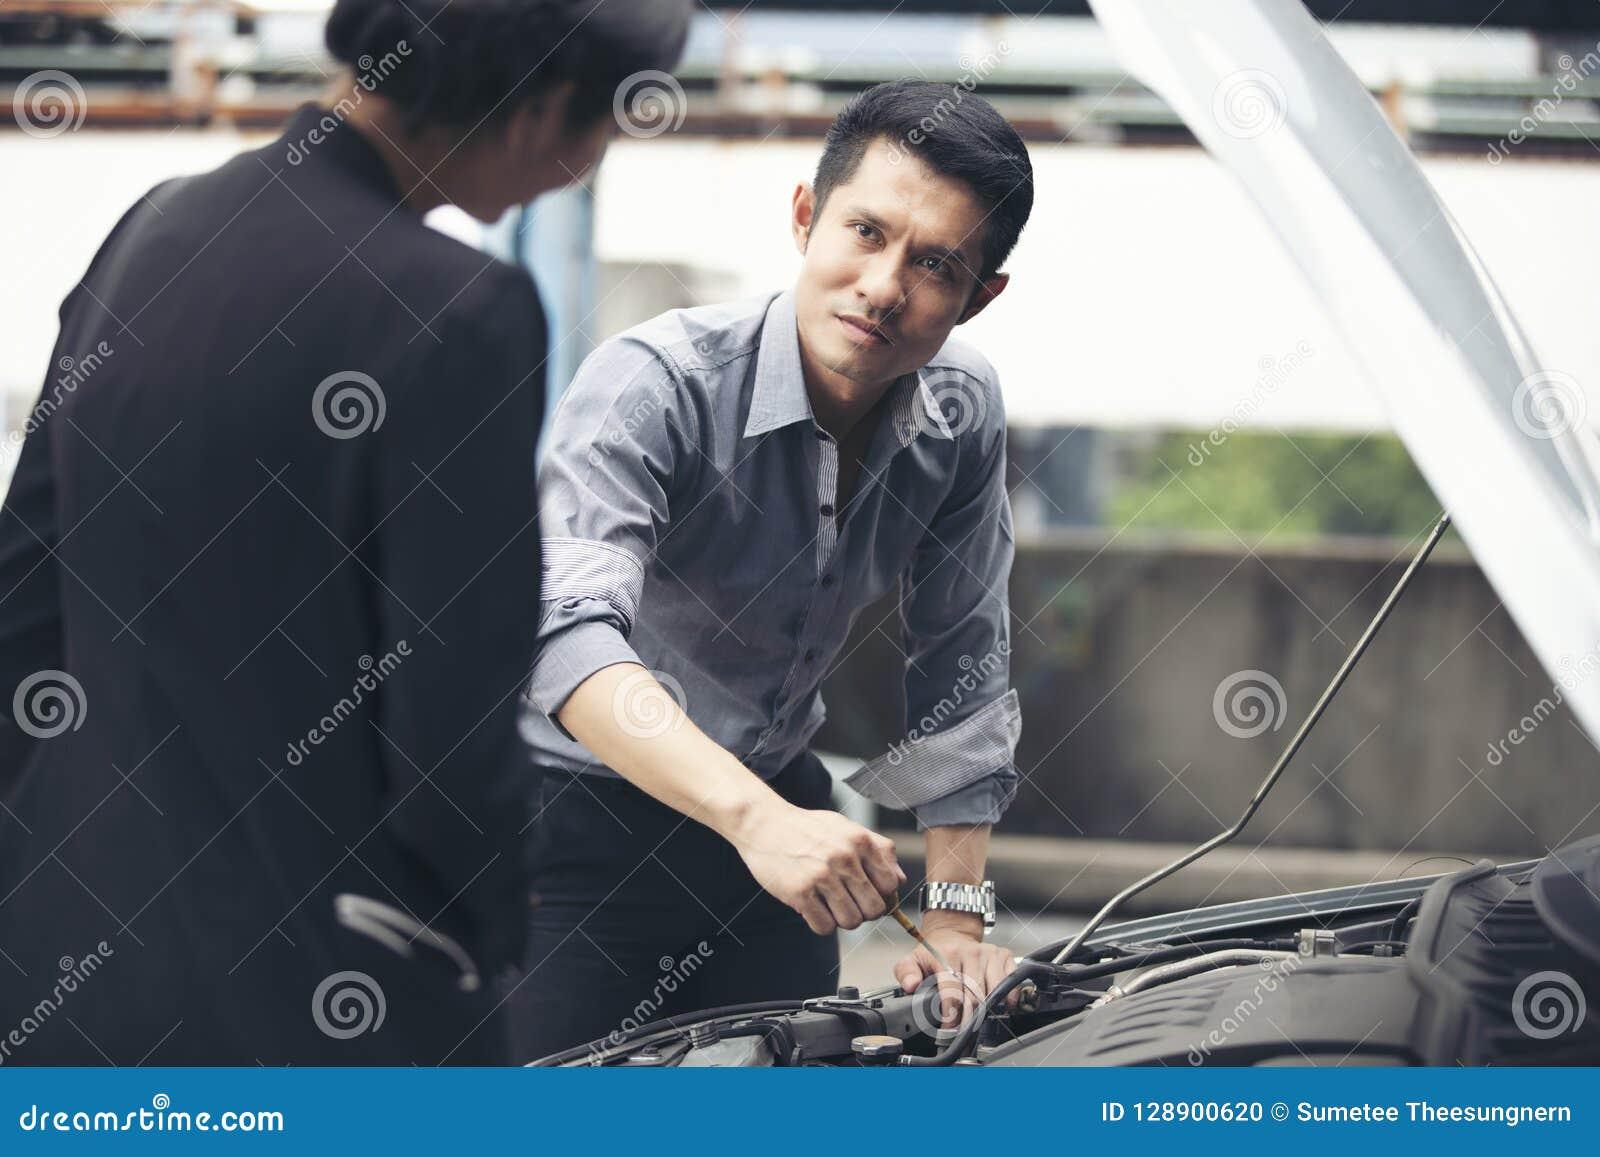 Businessmen help businesswomen check and repair broken cars